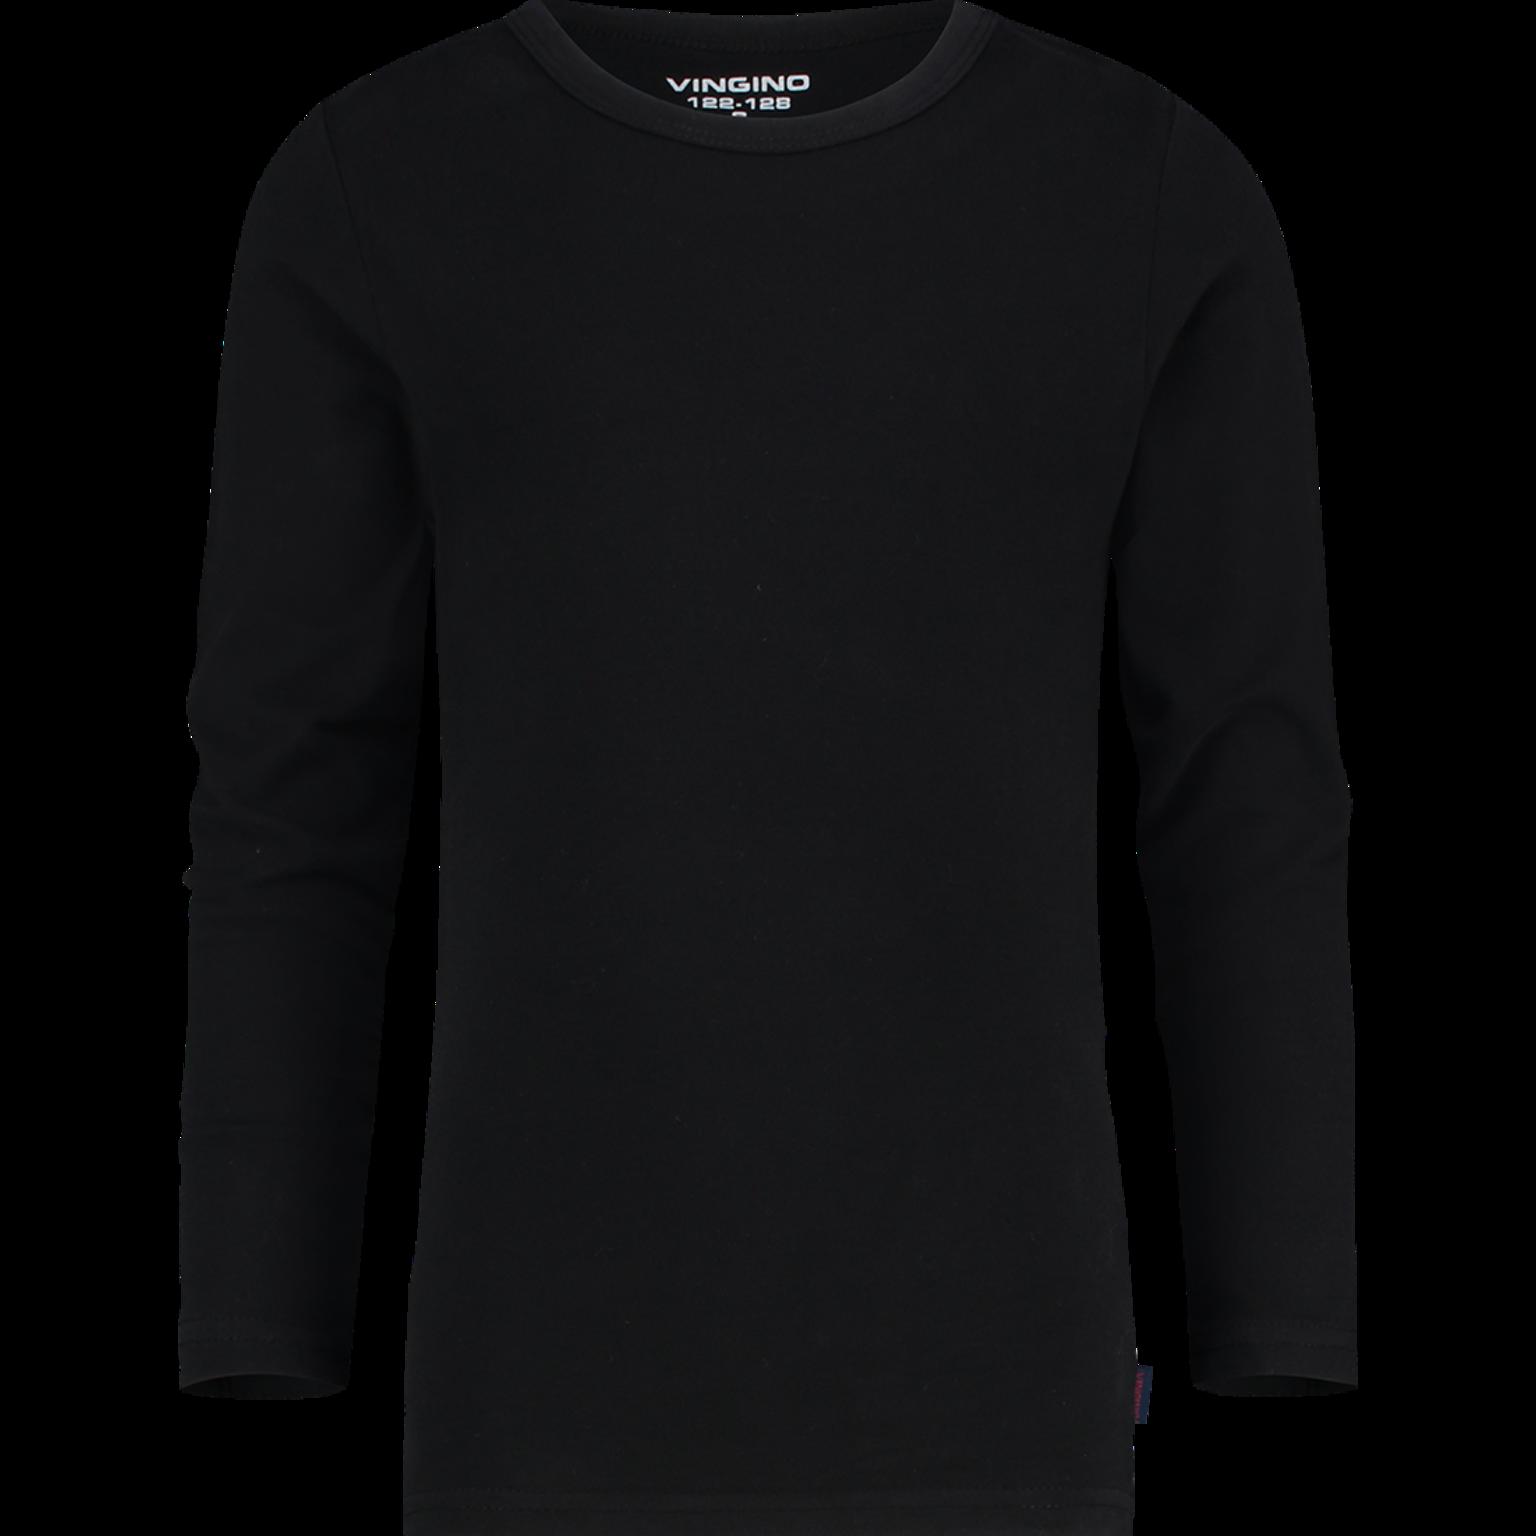 Vingino jongens T-shirt lange mouw - 72203 - zwart